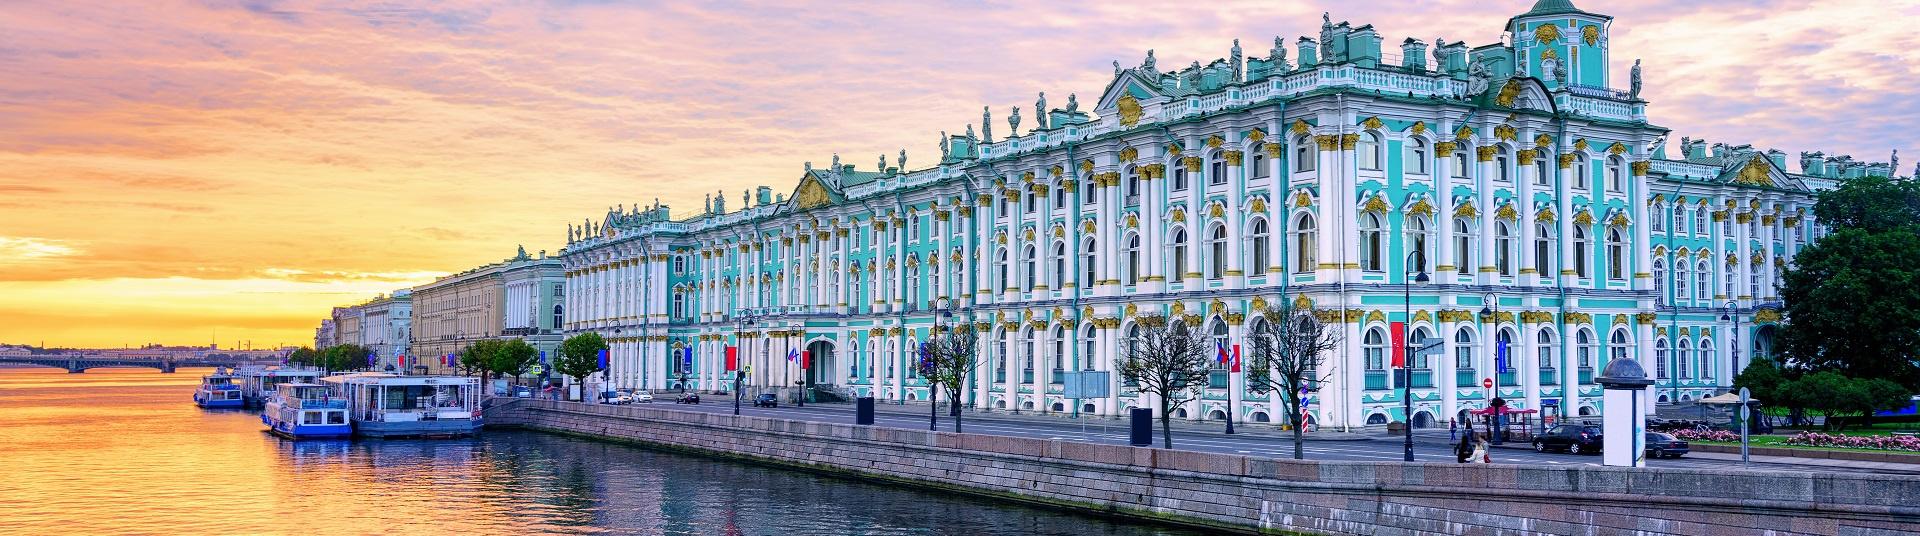 Week-end pas cher Saint Petersbourg